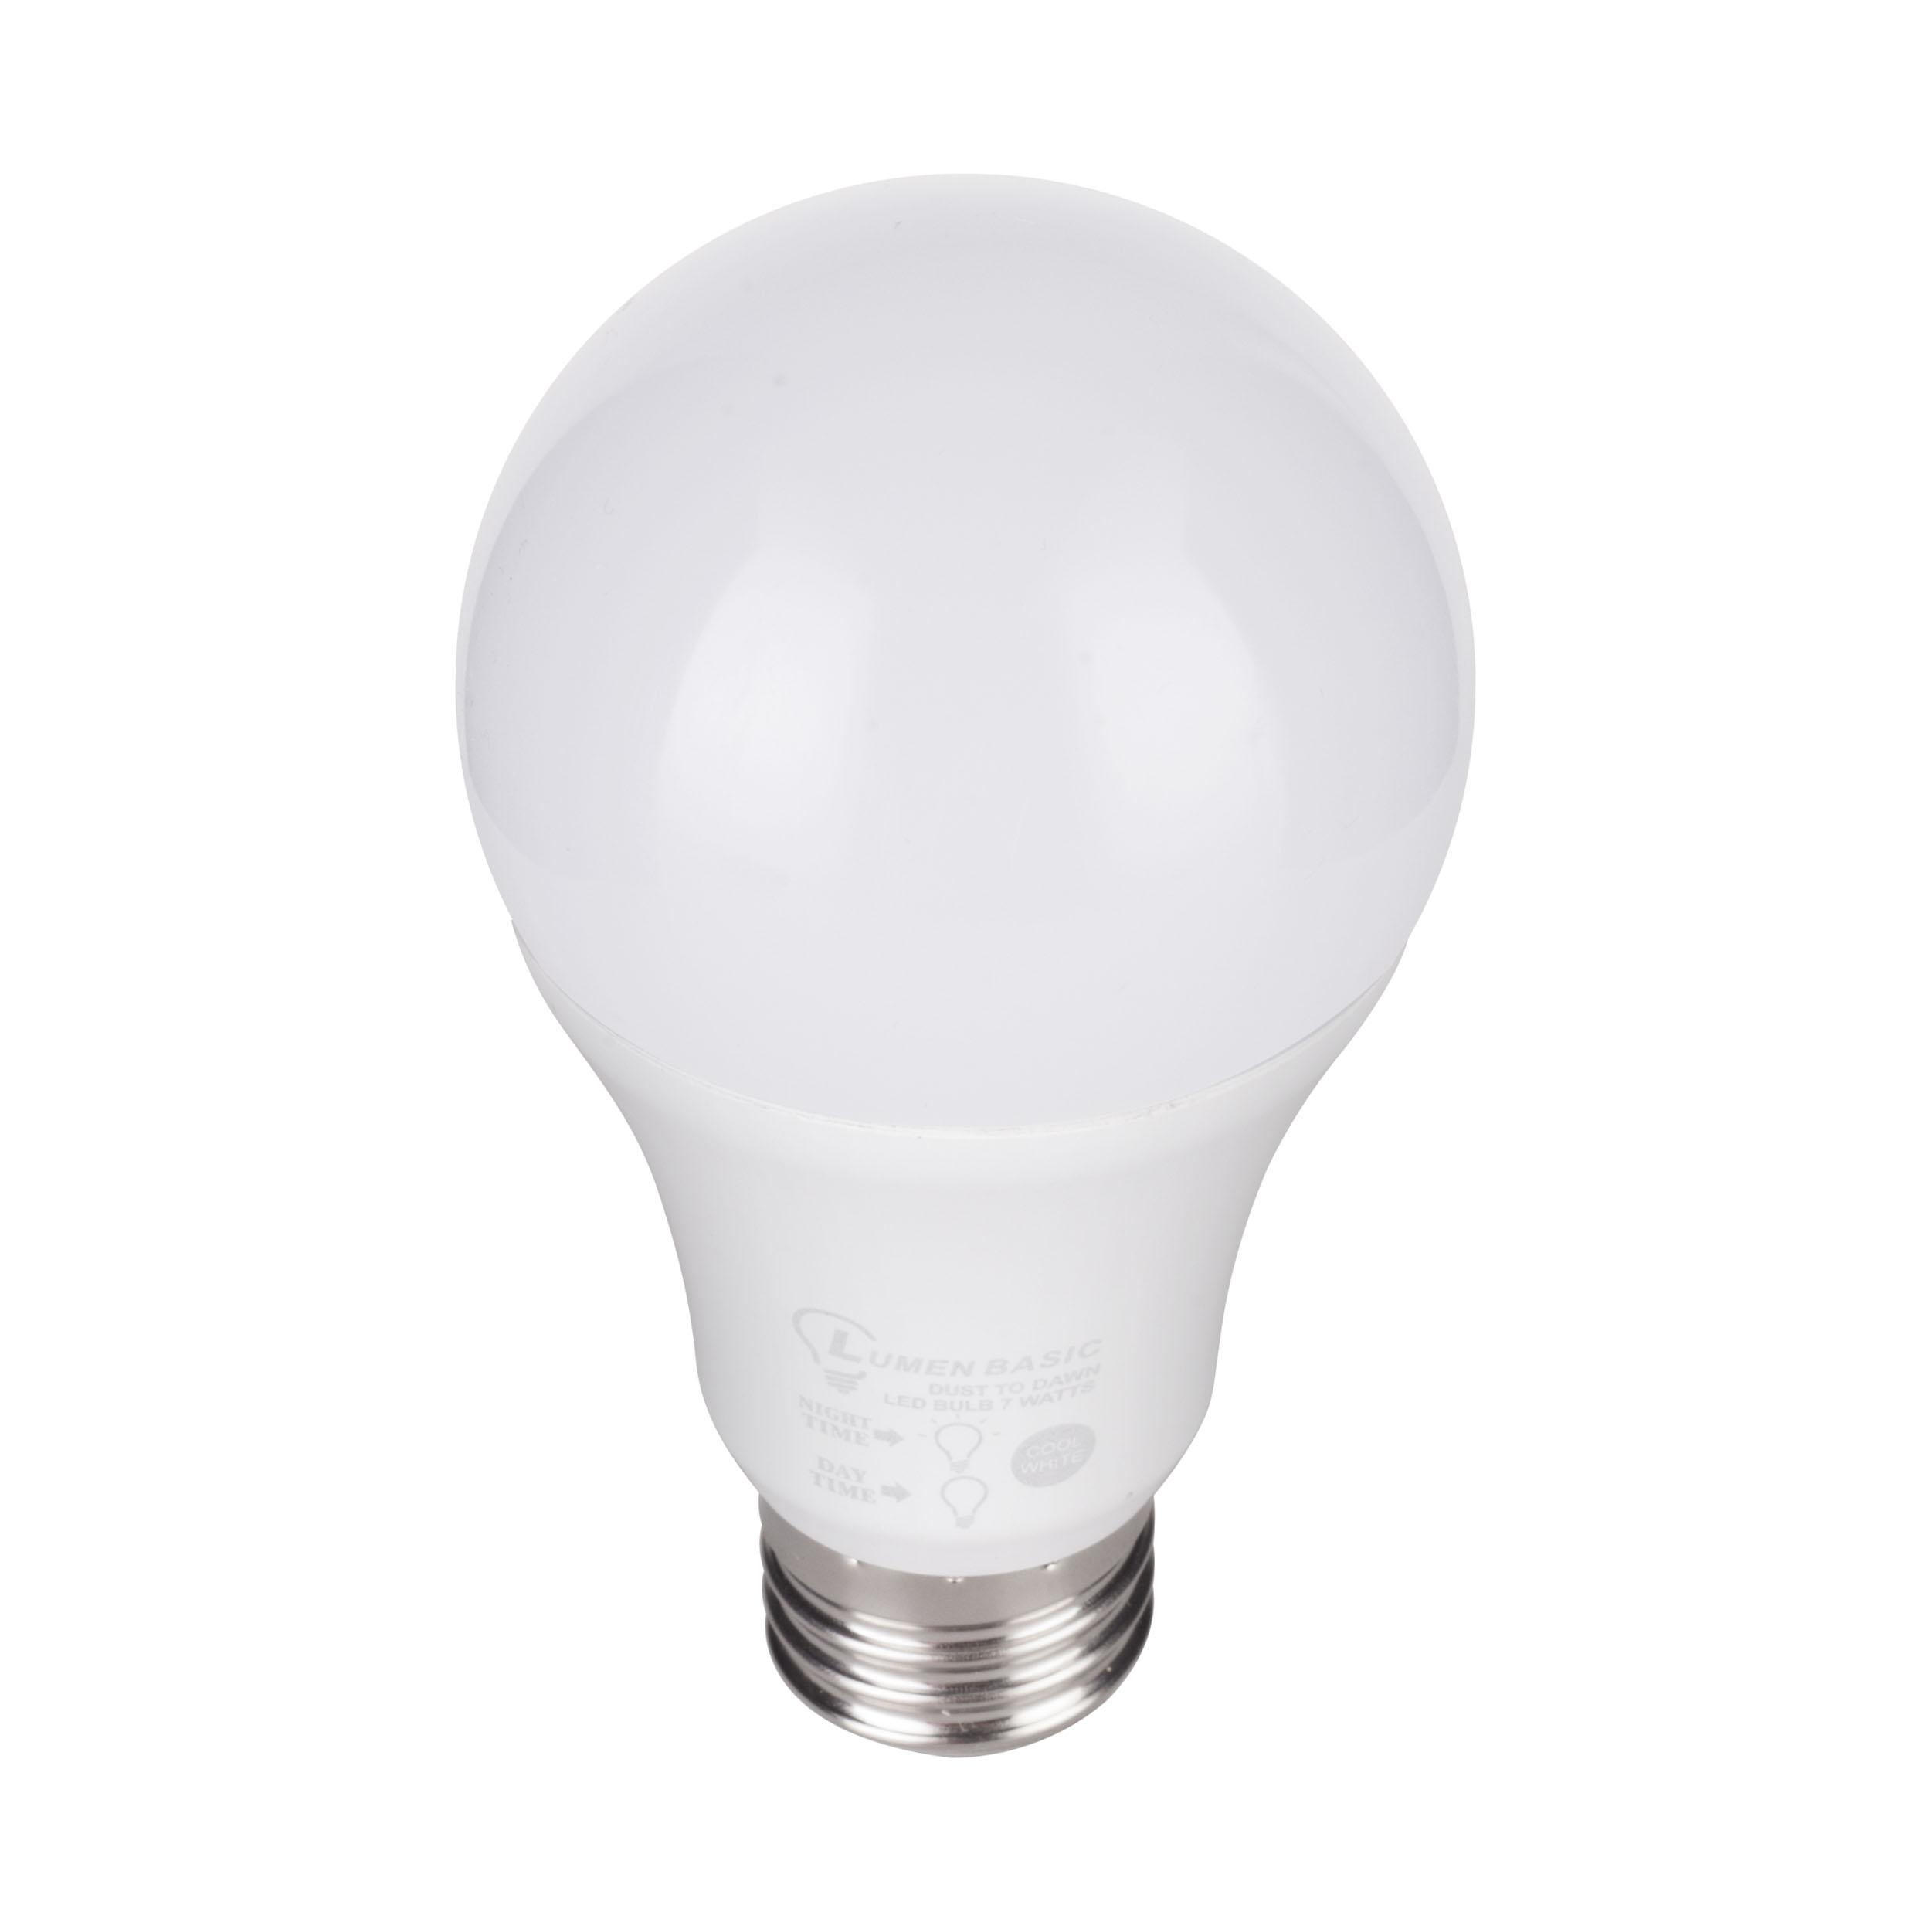 Lumenbasic Led Dusk To Dawn Bulb 60 Watt Incandescent